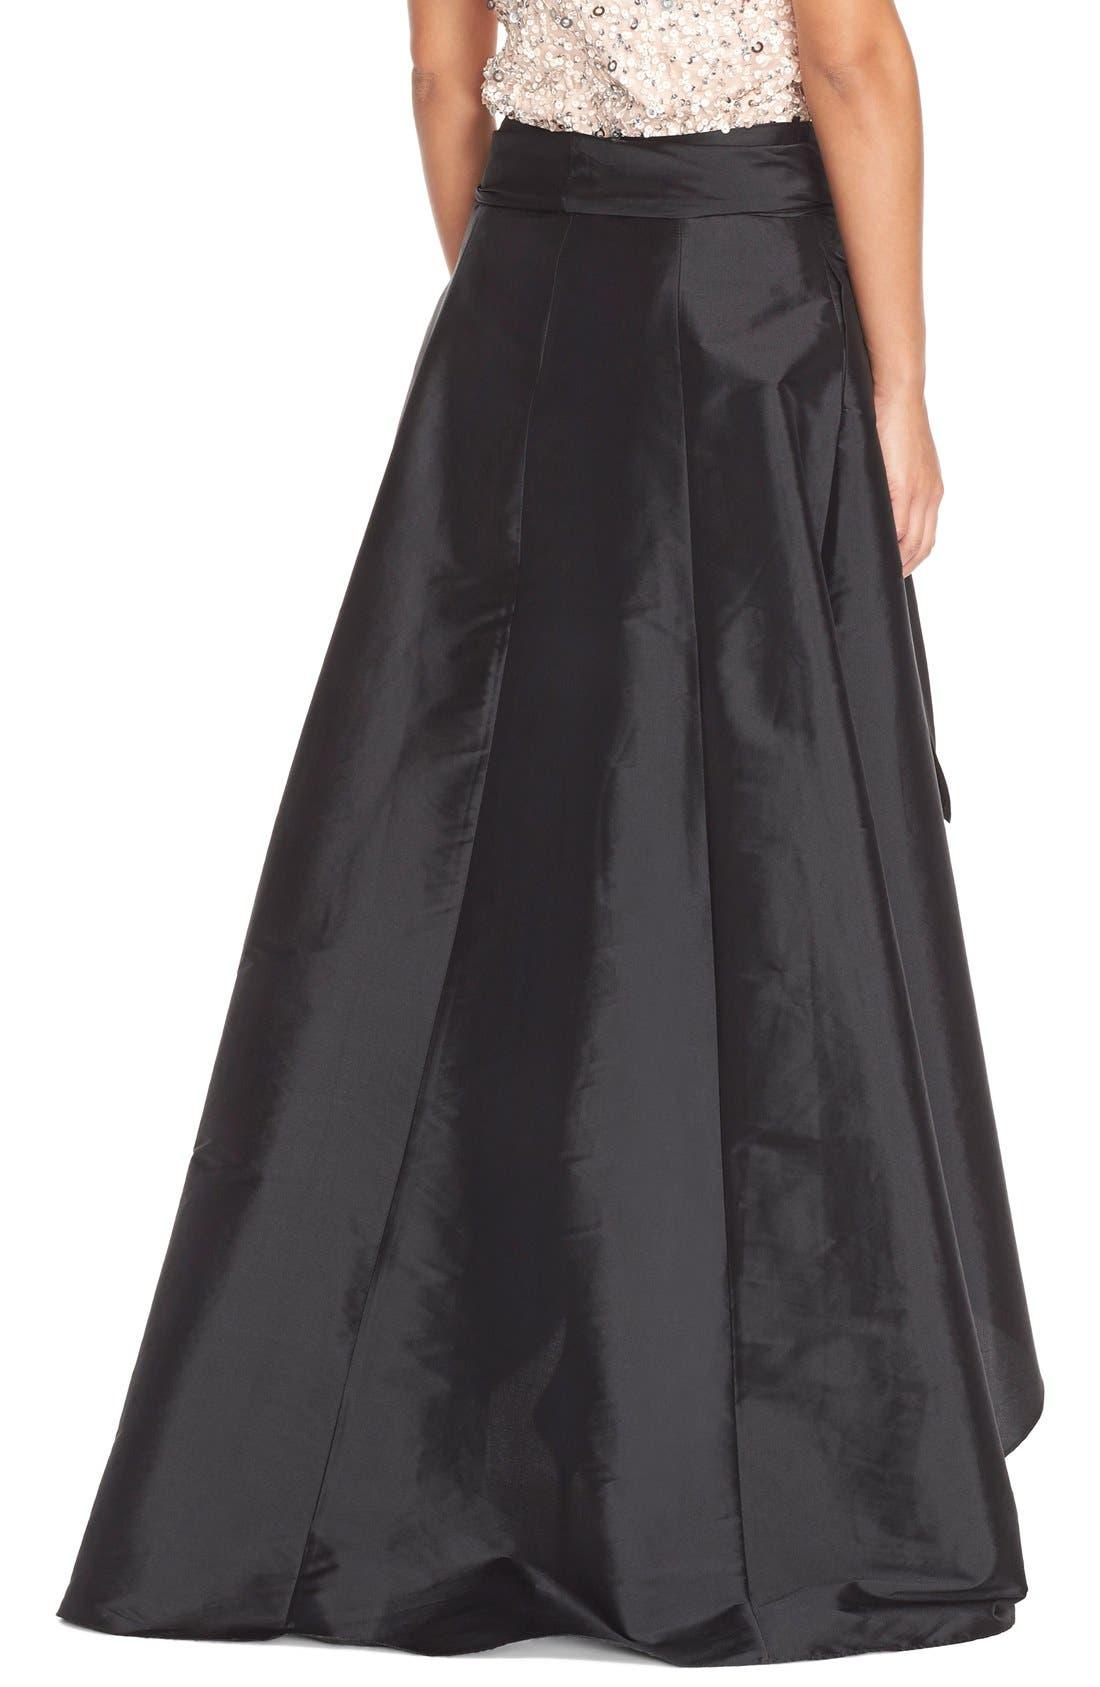 ADRIANNA PAPELL, High/Low Taffeta Ball Skirt, Alternate thumbnail 2, color, 001